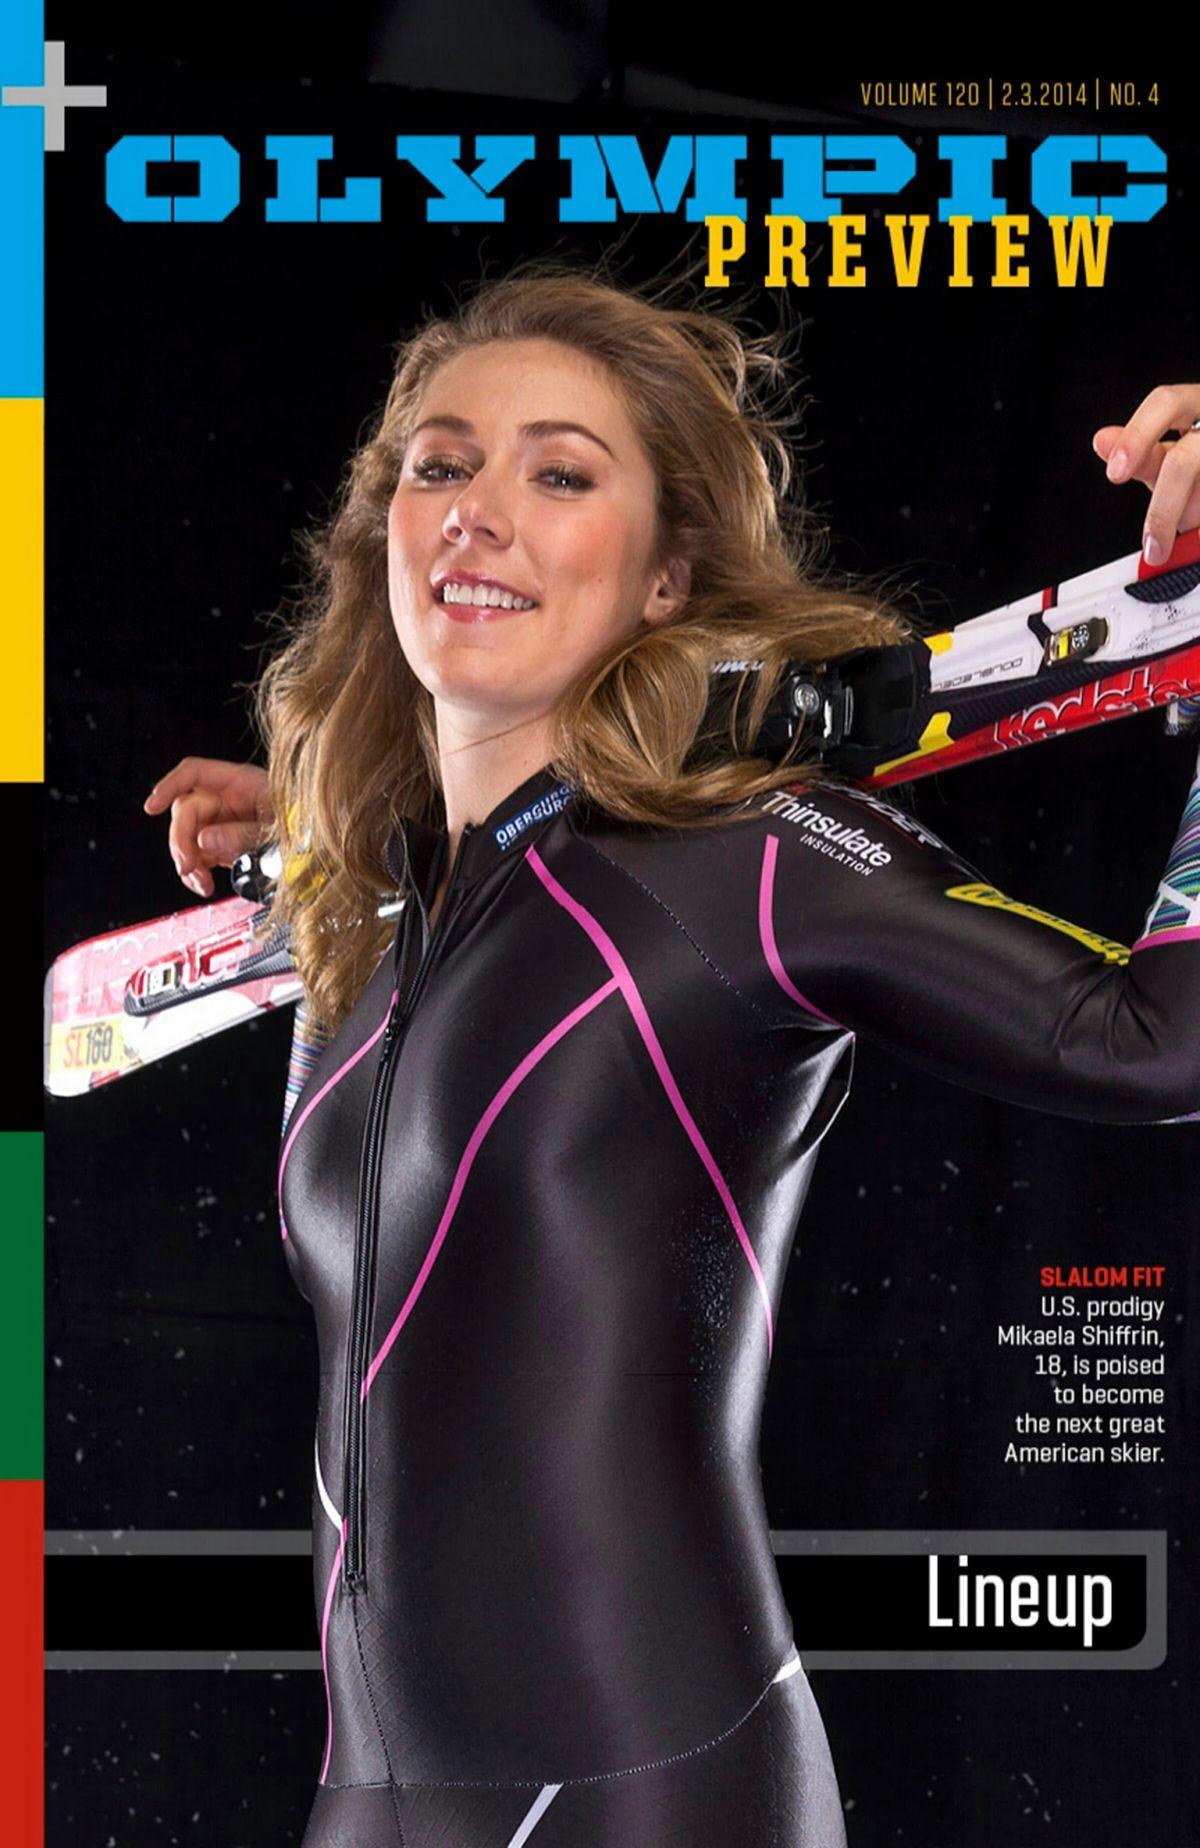 MIKAELA SHIFFRIN - Sports Illustrated Magaznie, February 2014 Issue - HawtCelebs